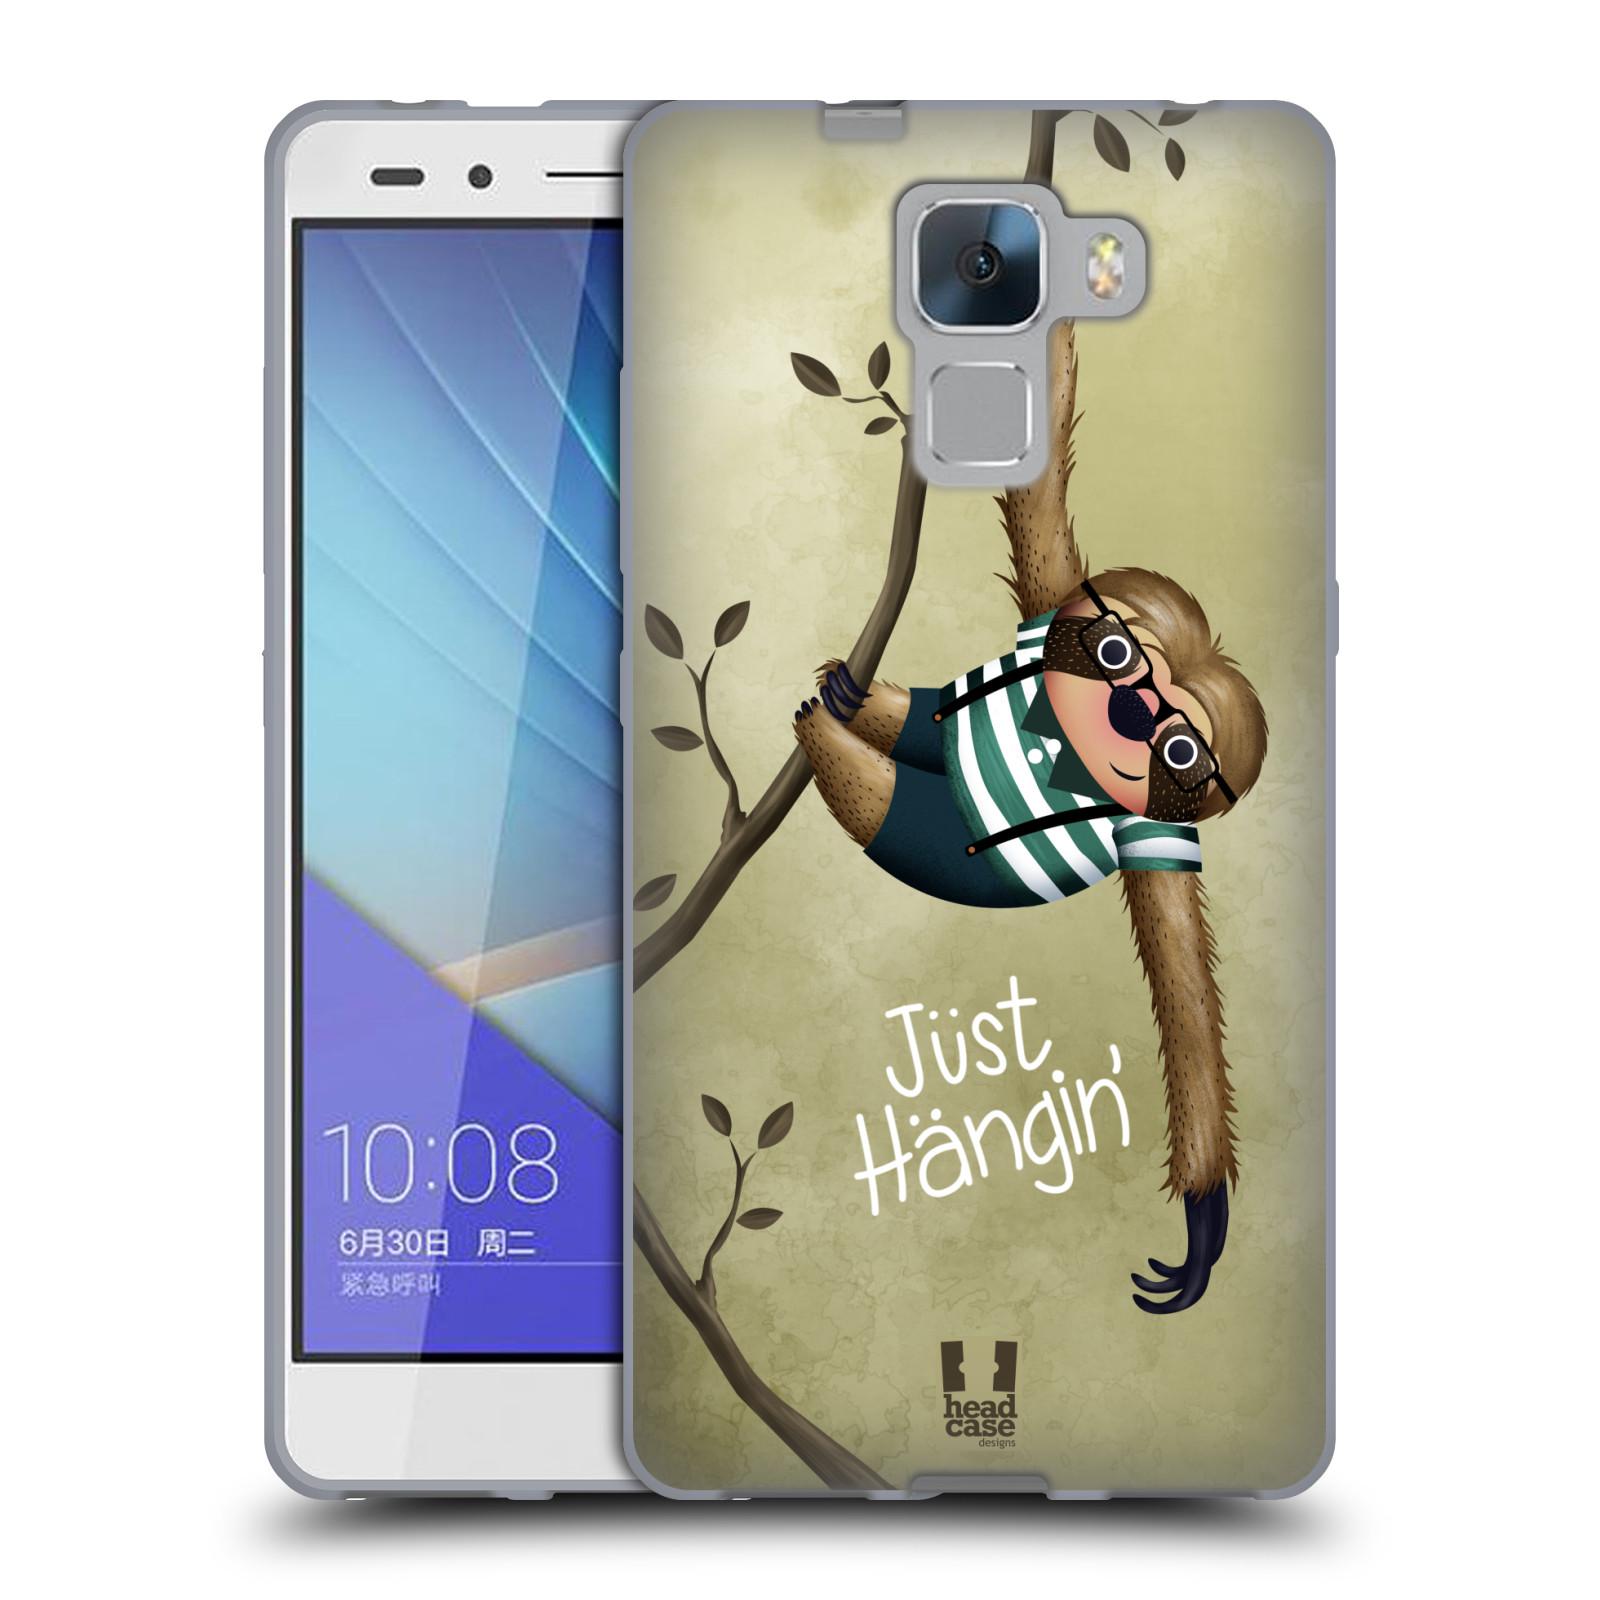 Silikonové pouzdro na mobil Honor 7 HEAD CASE Lenochod Just Hangin